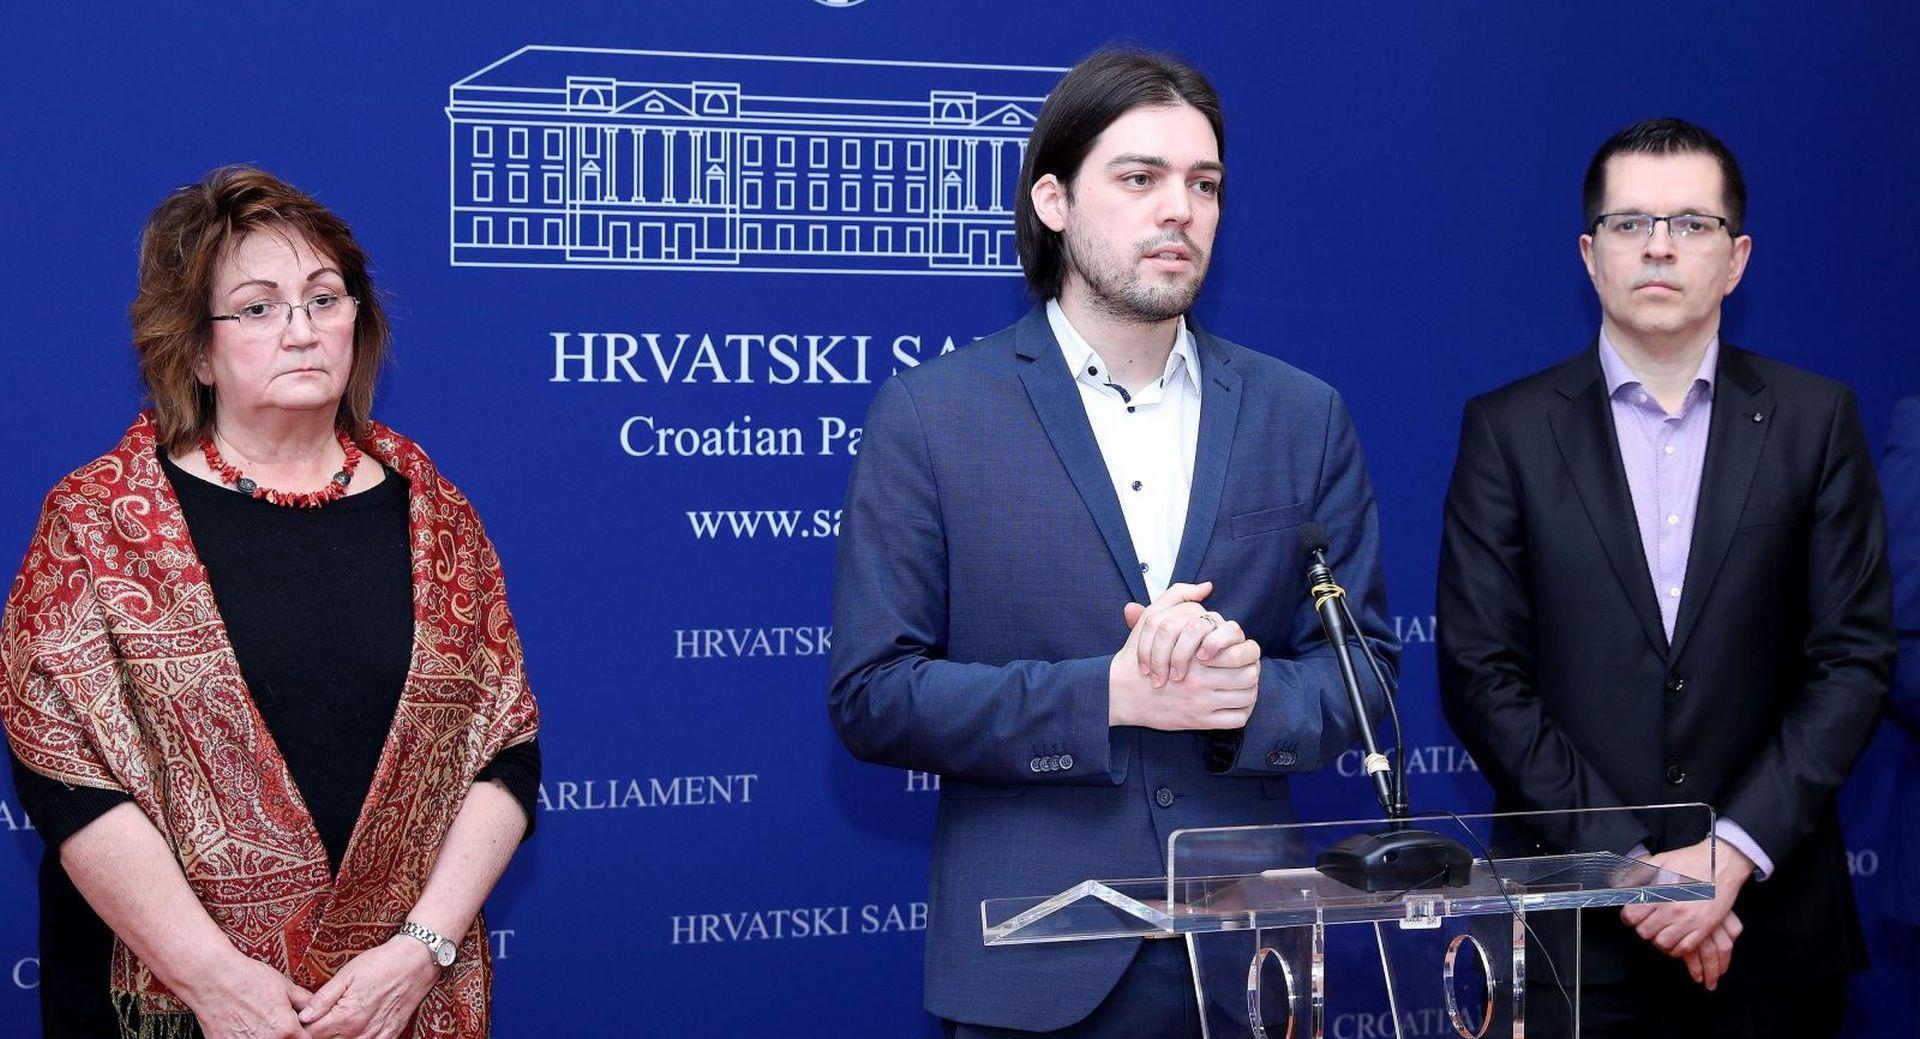 Sinčić se ogradio od Pernara i Vuletića